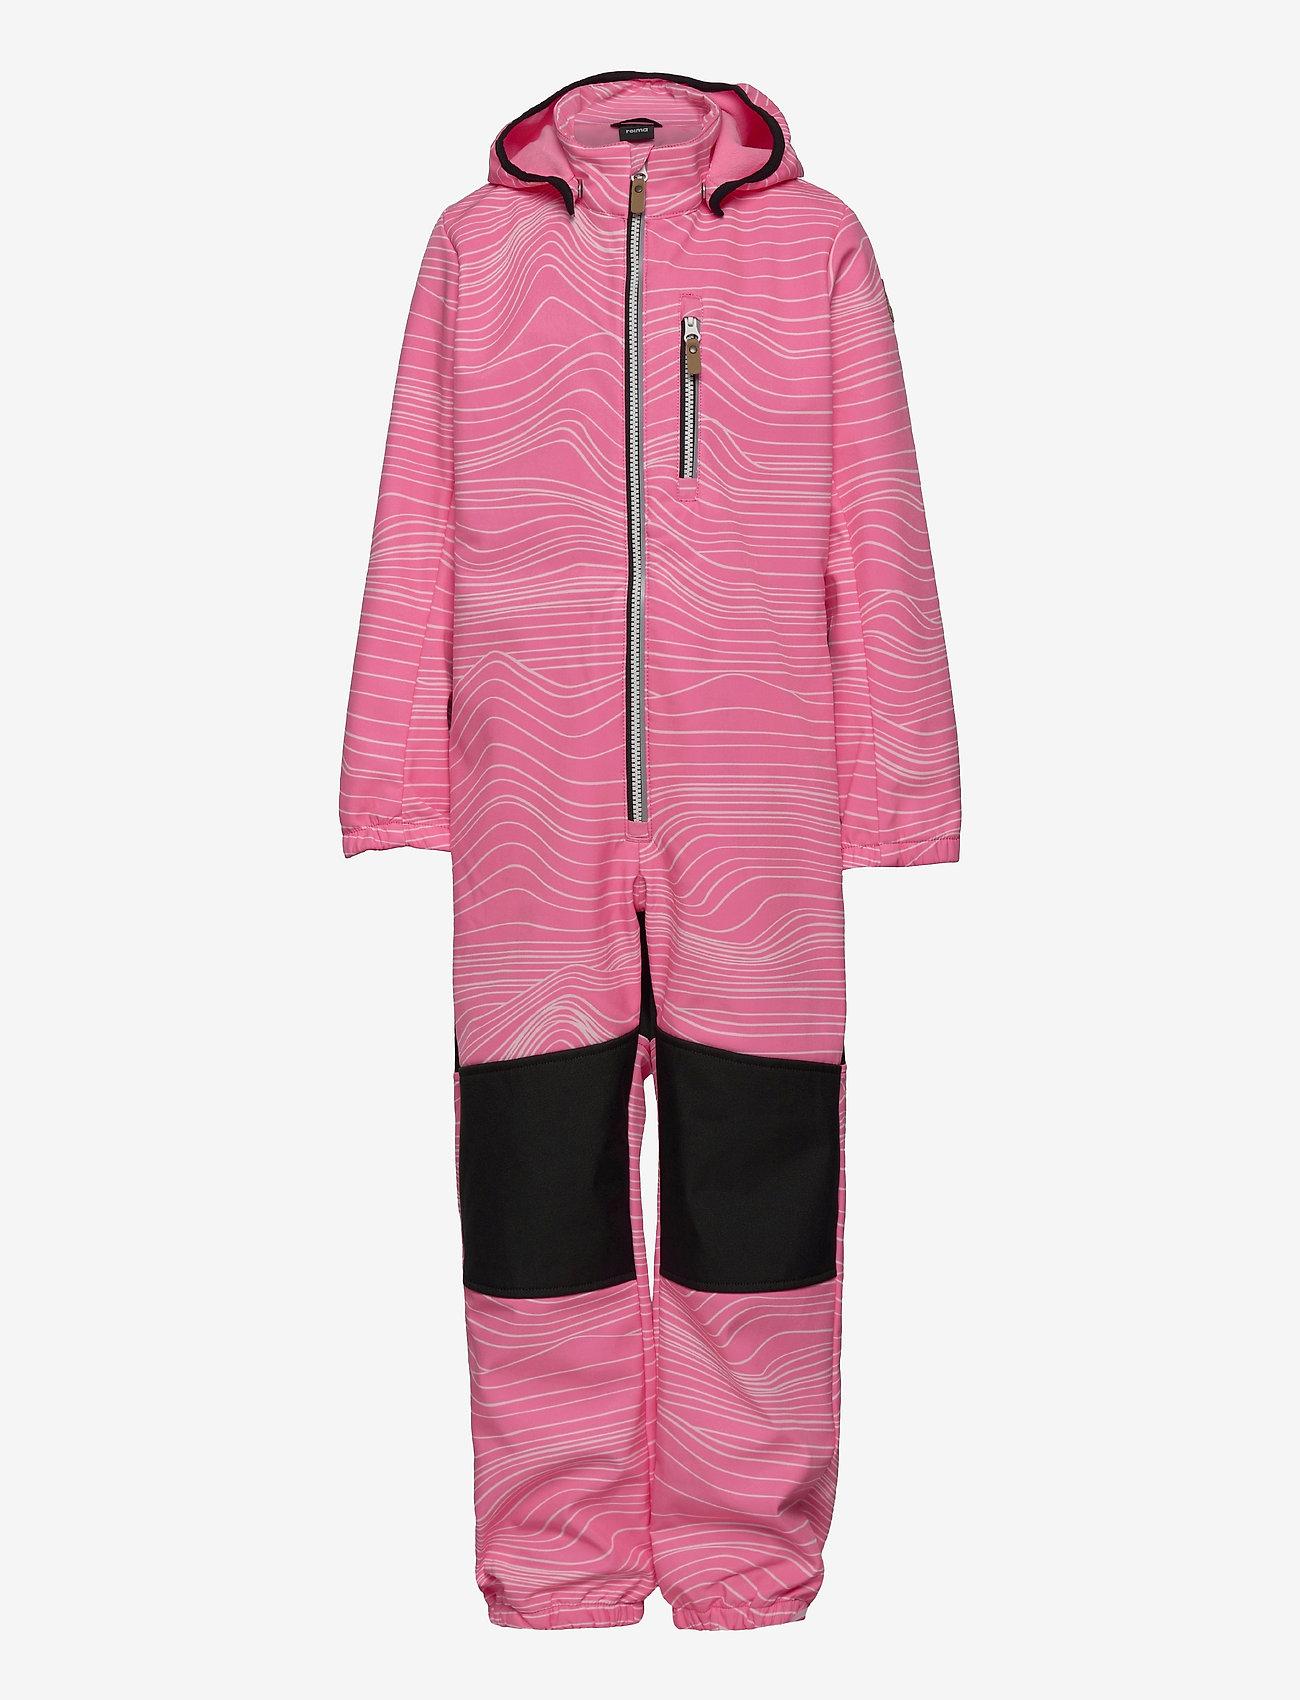 Reima - Nurmes - softshells - neon pink - 0